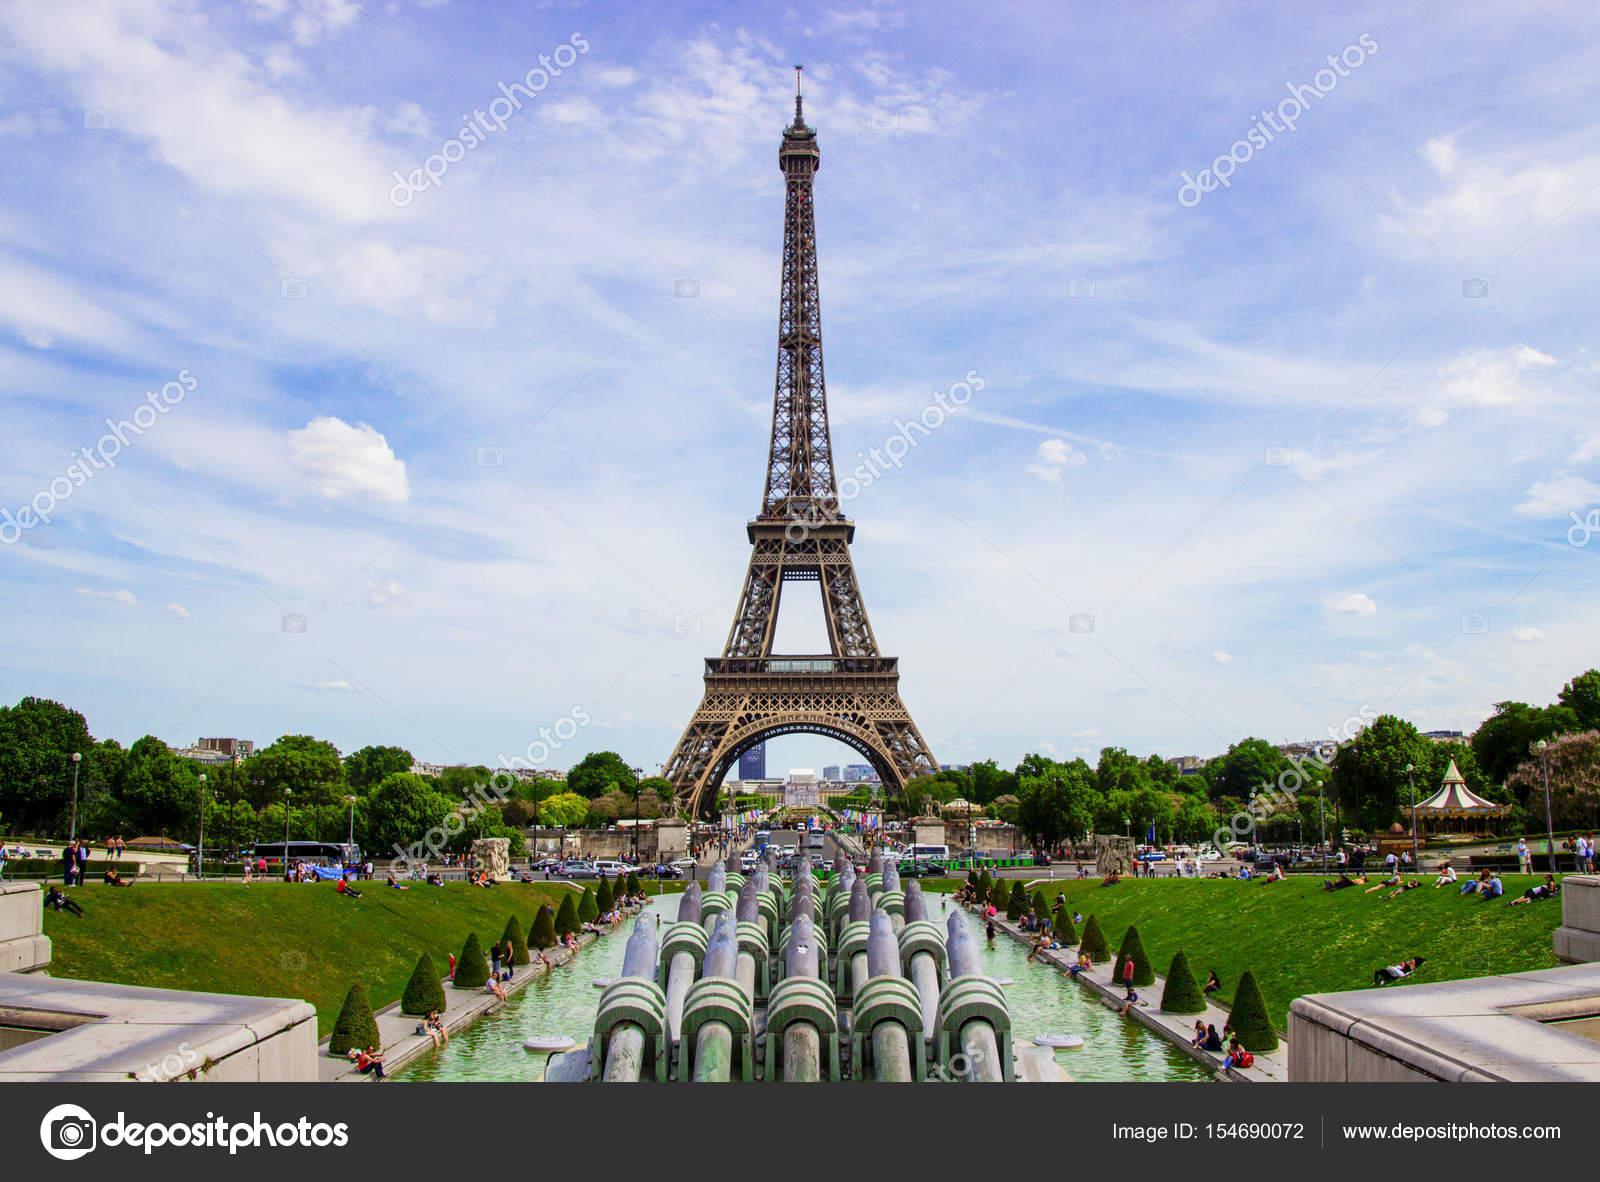 Famosos A Torre Eiffel, em Paris, França. Torre Eiffel, símbolo de Paris  BS65